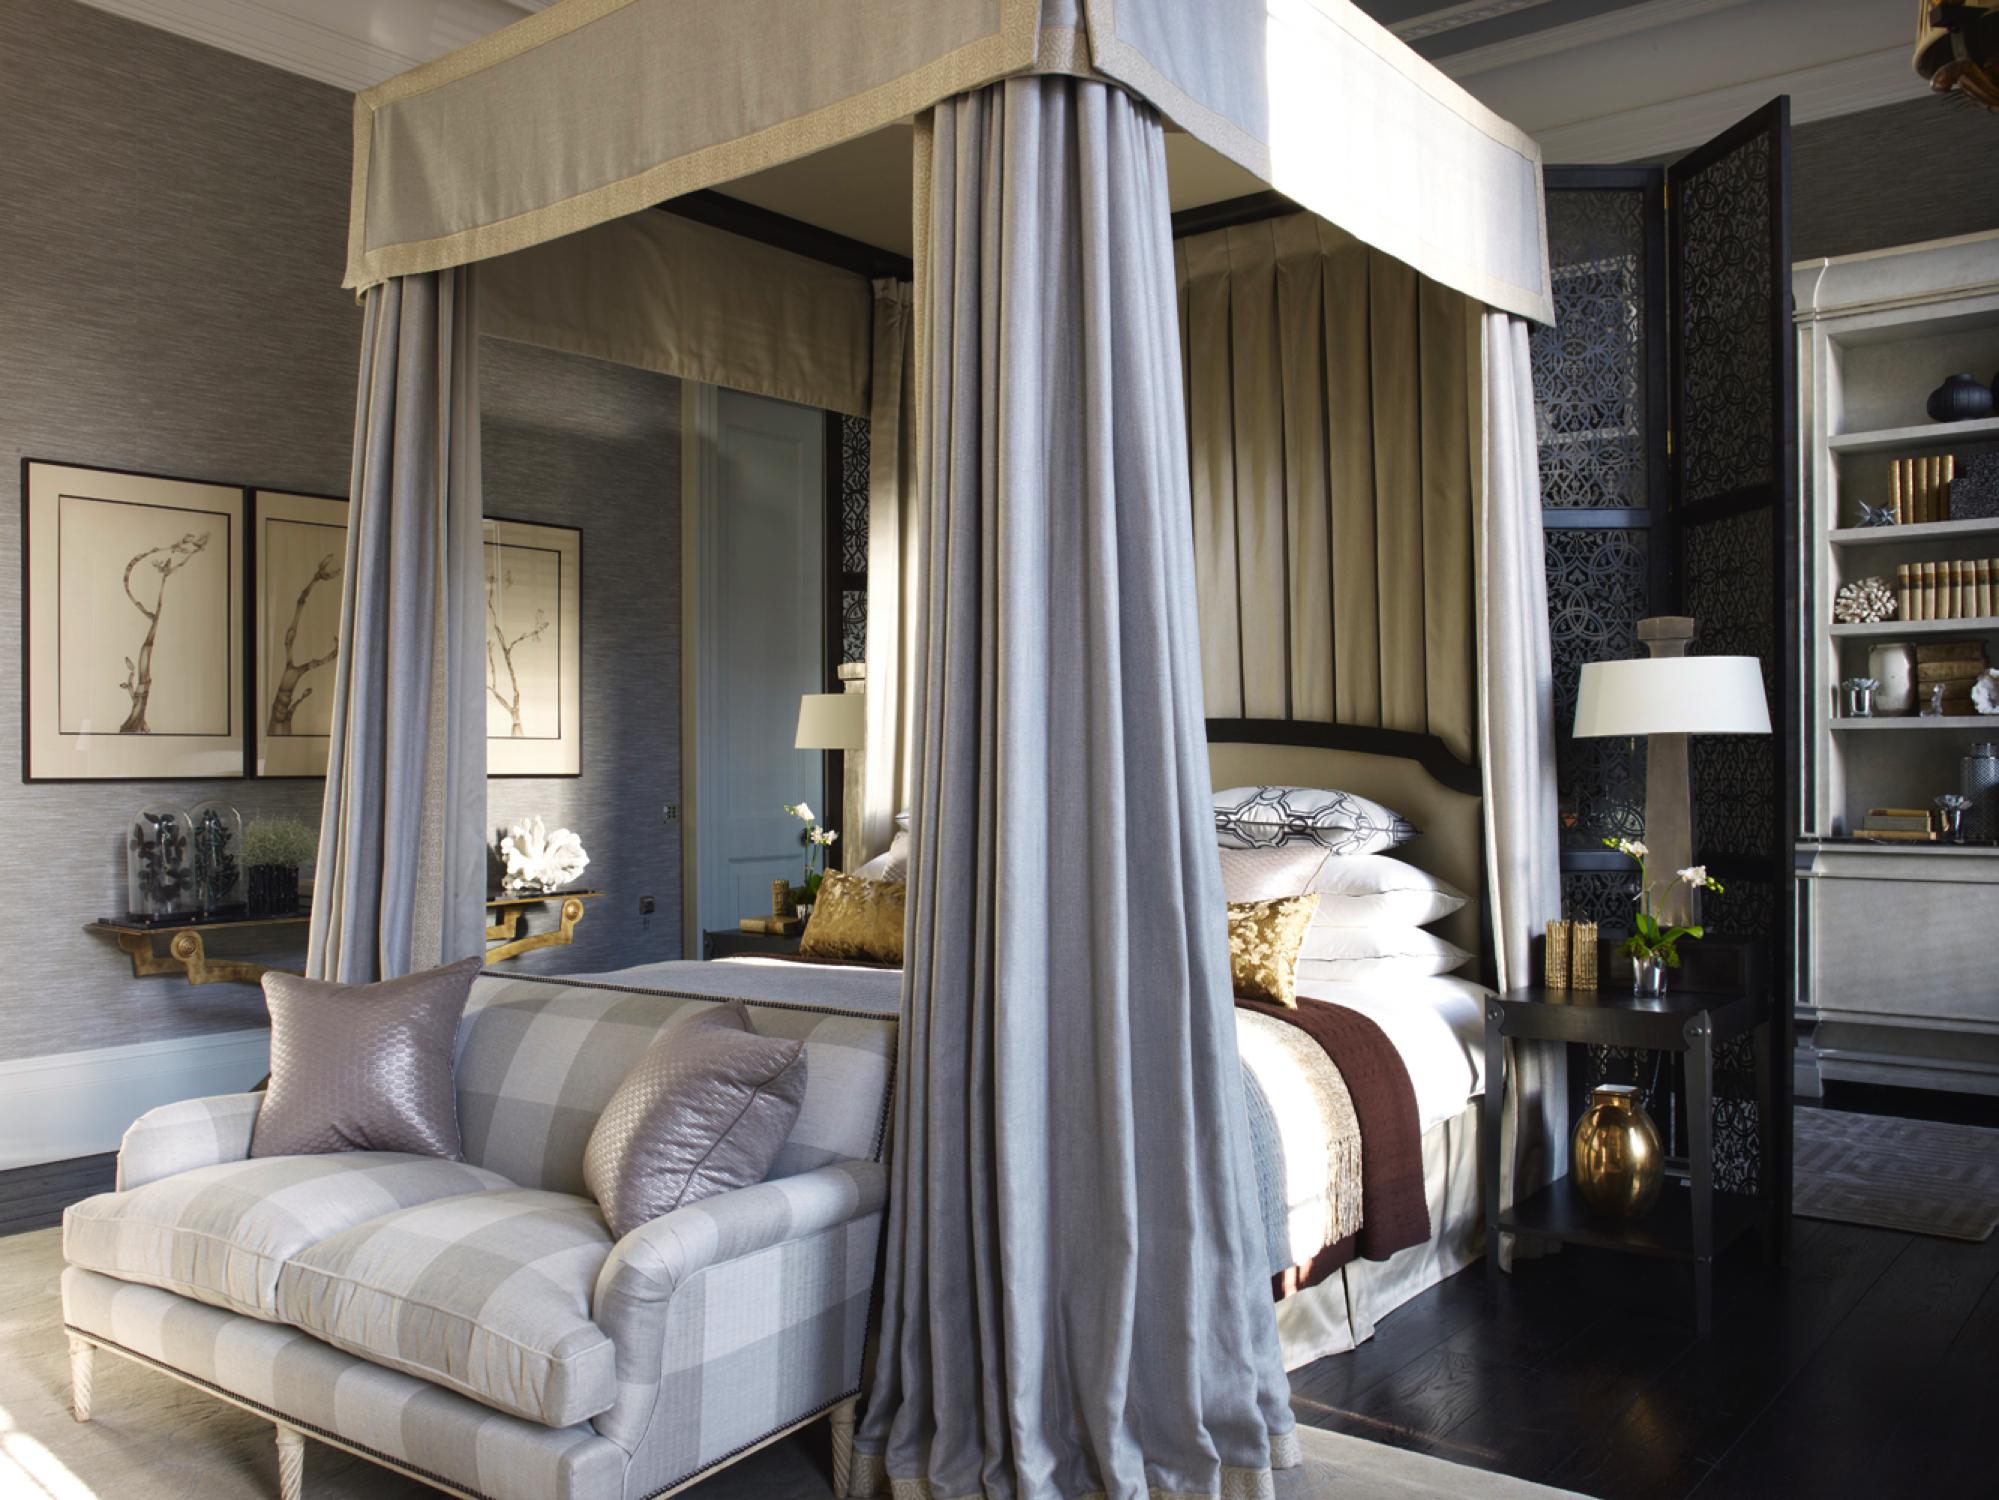 Regents Park bedroom with canopy bed by Hubert Zandberg Interiors